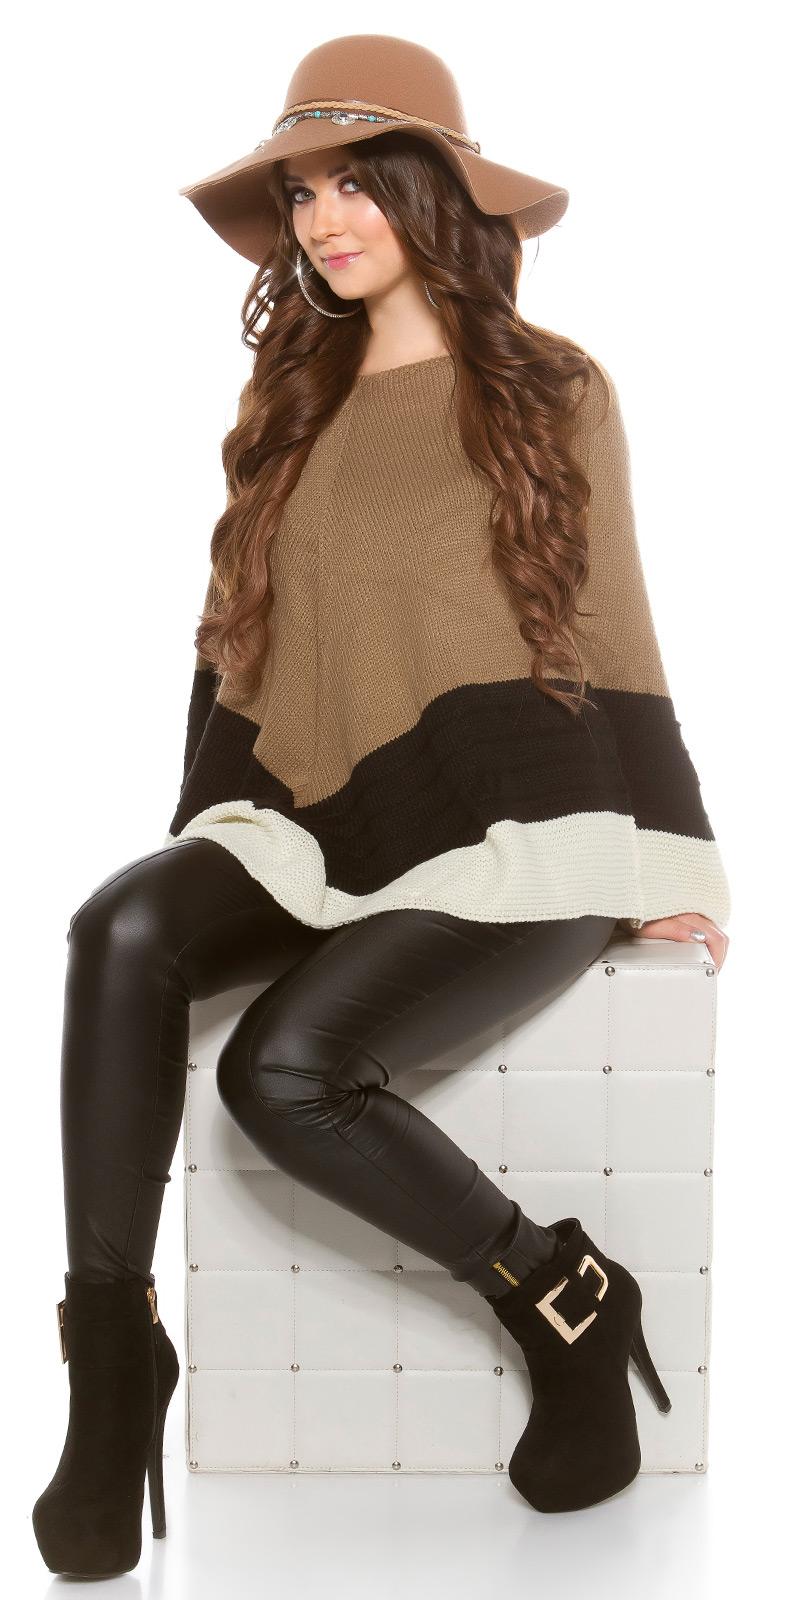 Elegant Ladies Poncho Sweater Cardigan Knitted Poncho ...